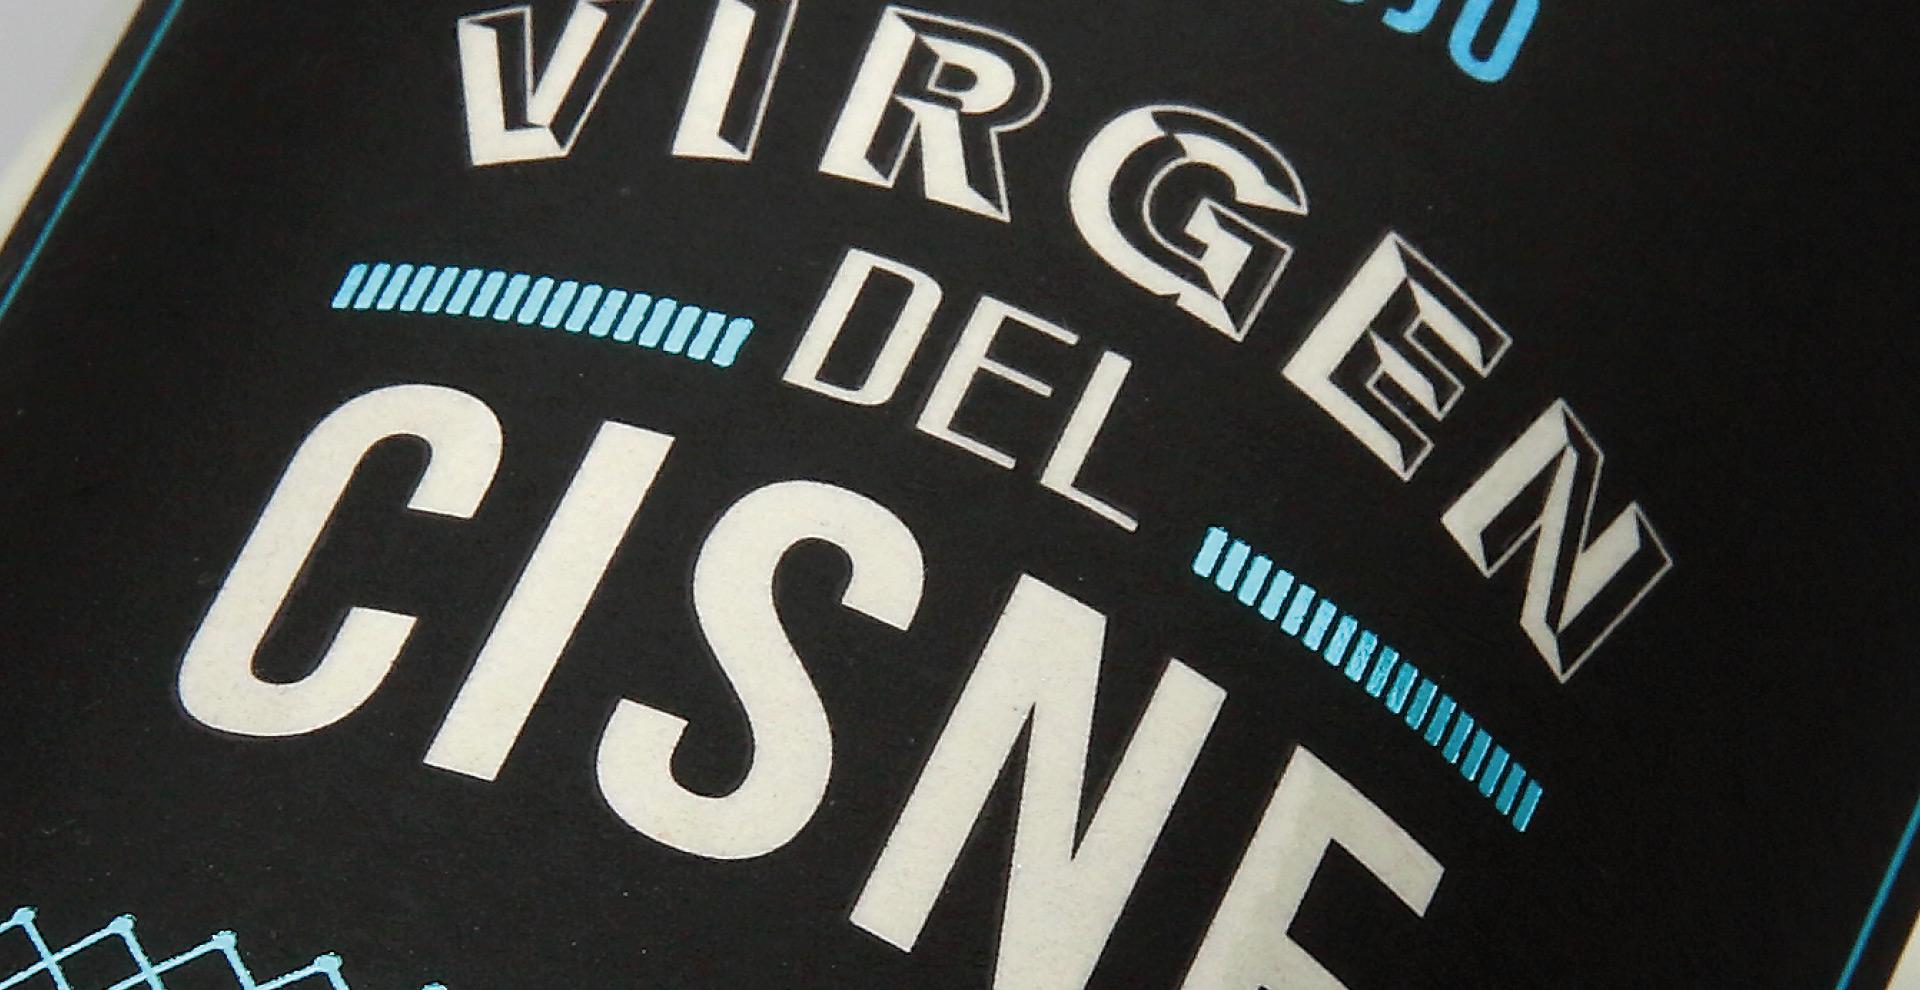 destileria_virgen_del_cisne-virgen_del_cisne-cabecera